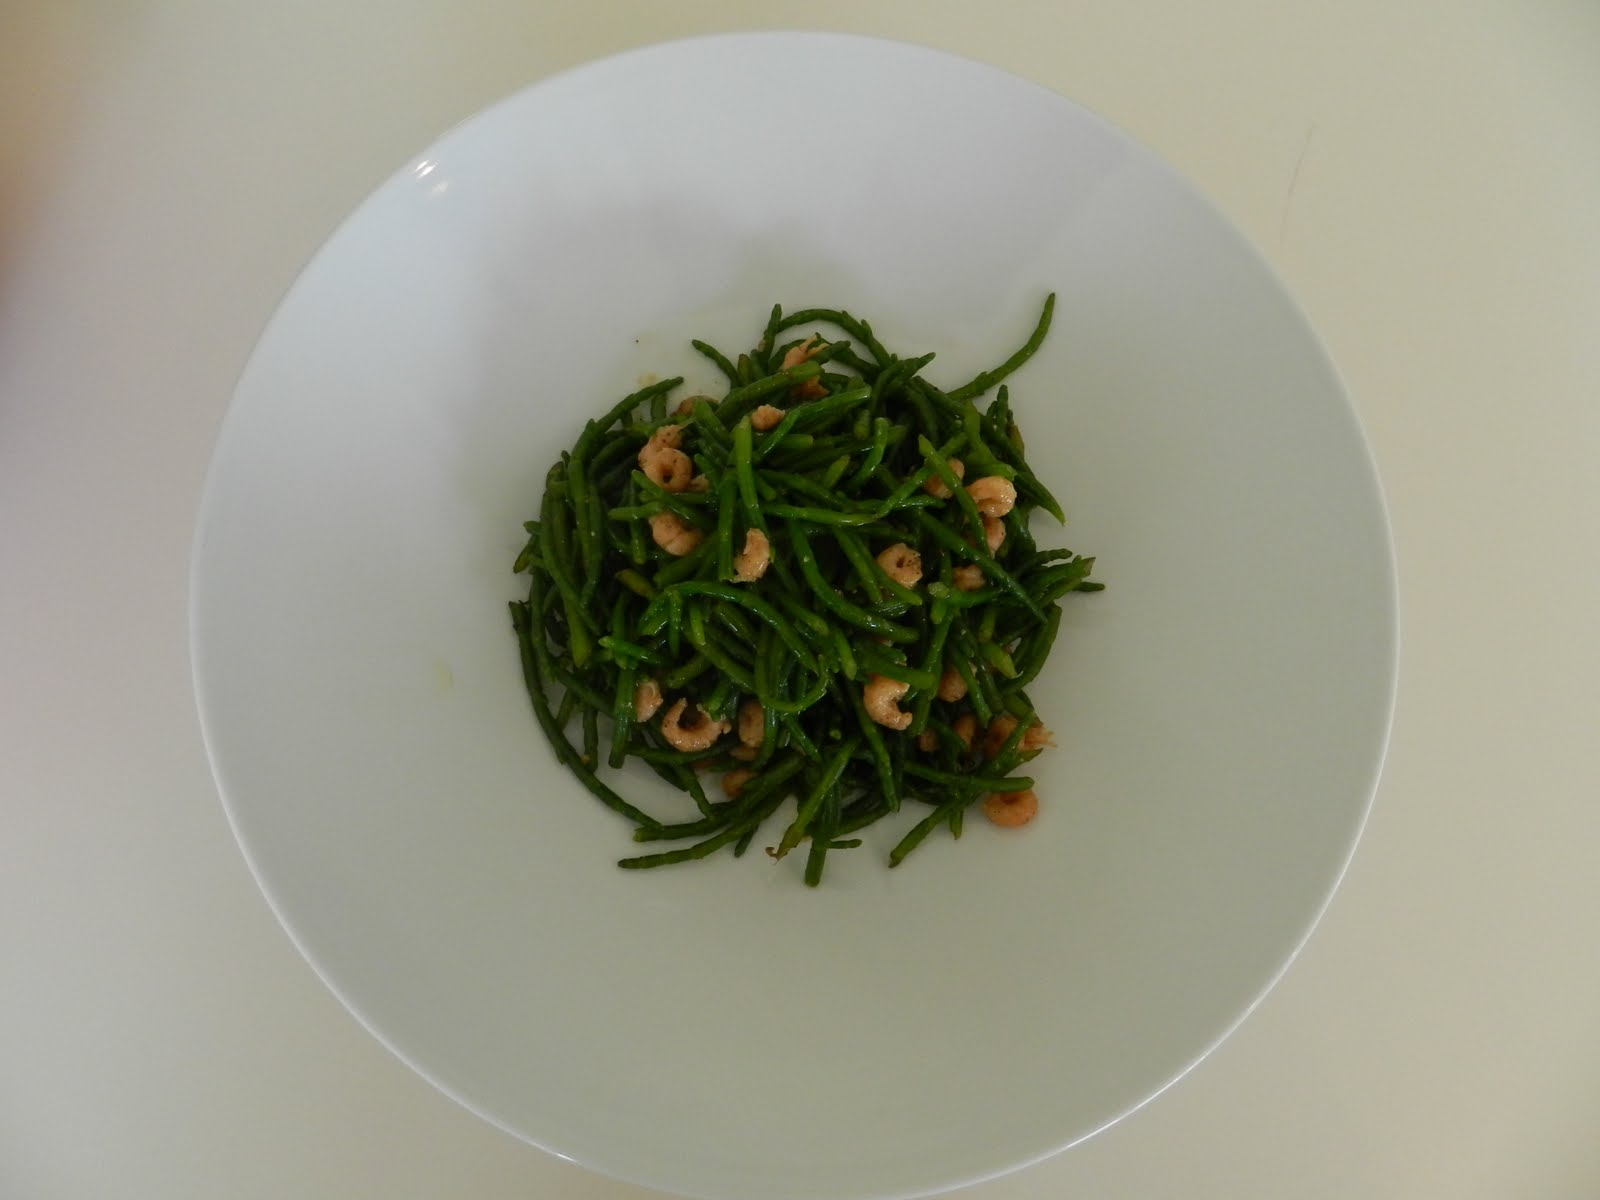 Samphire grass with our homemade potted shrimp.